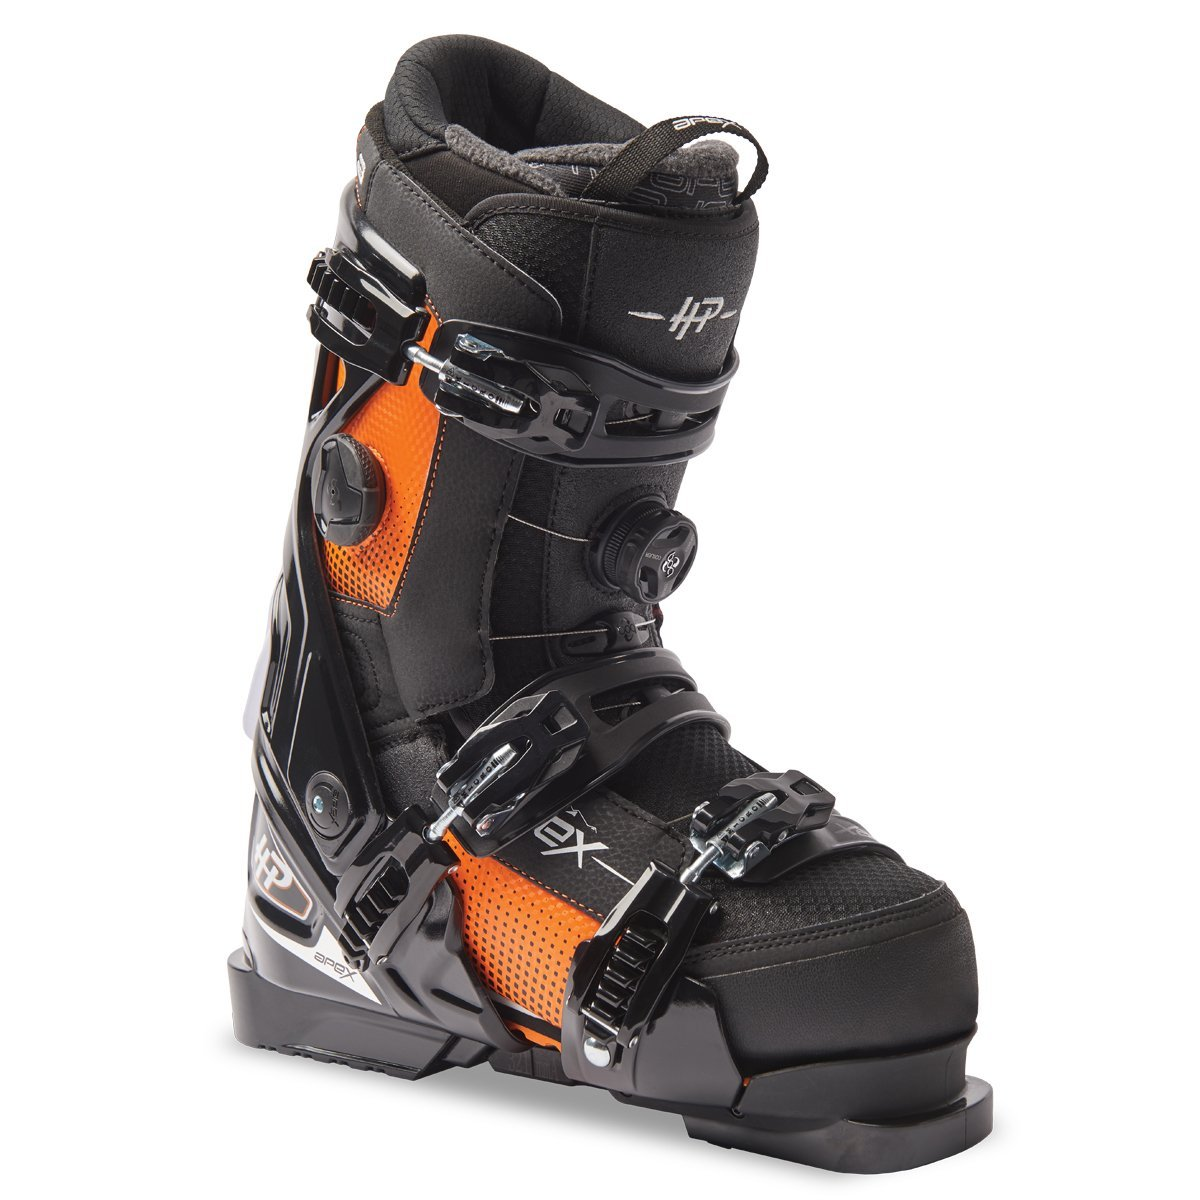 Apex HP Ski Boots 2019